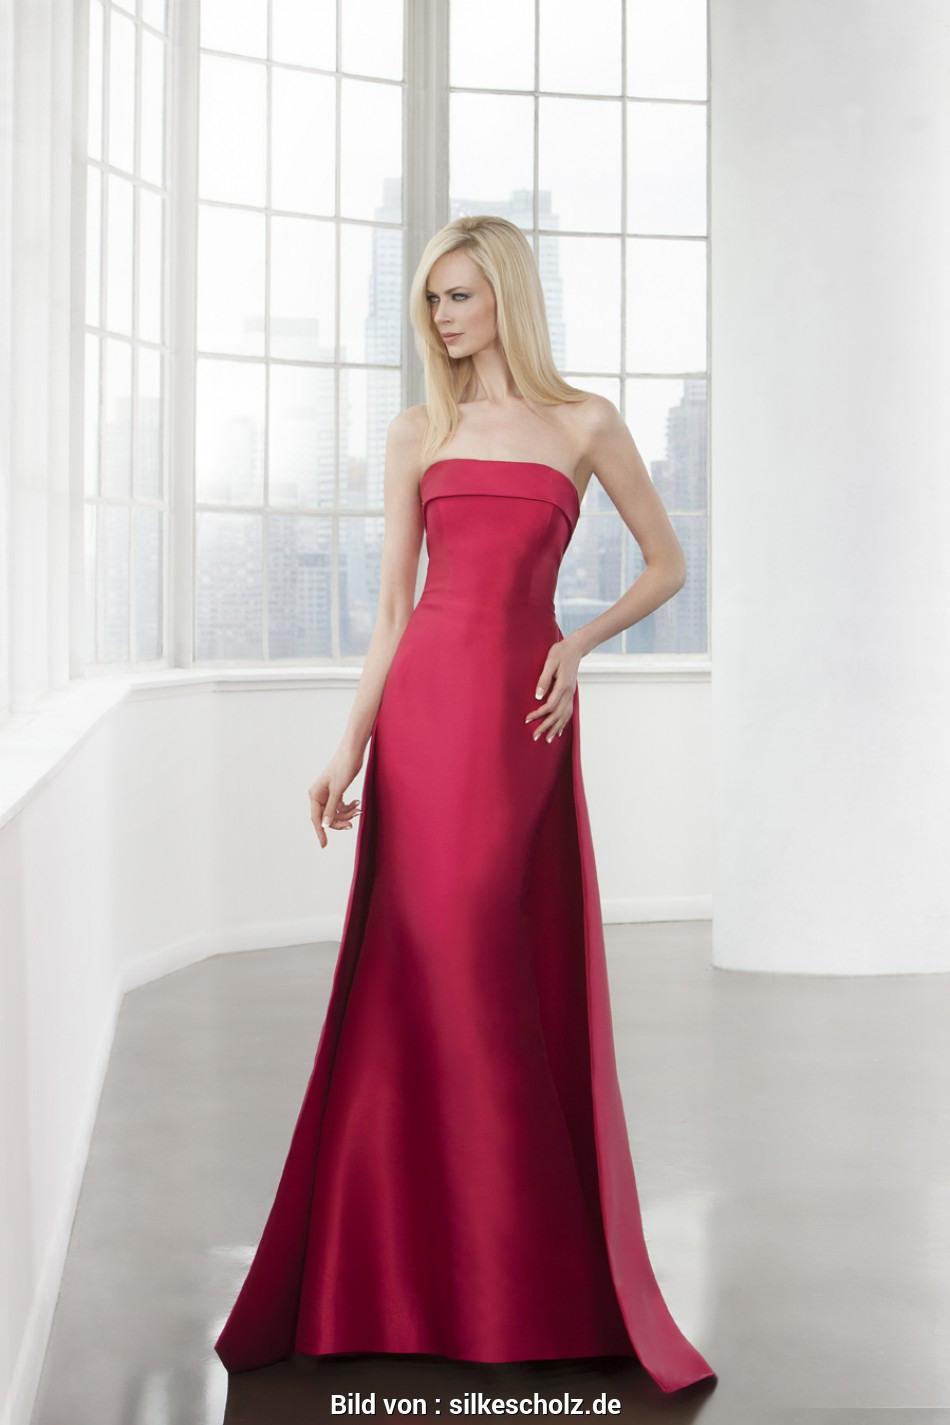 15 Perfekt Abend Kleider Frankfurt Spezialgebiet15 Wunderbar Abend Kleider Frankfurt Bester Preis